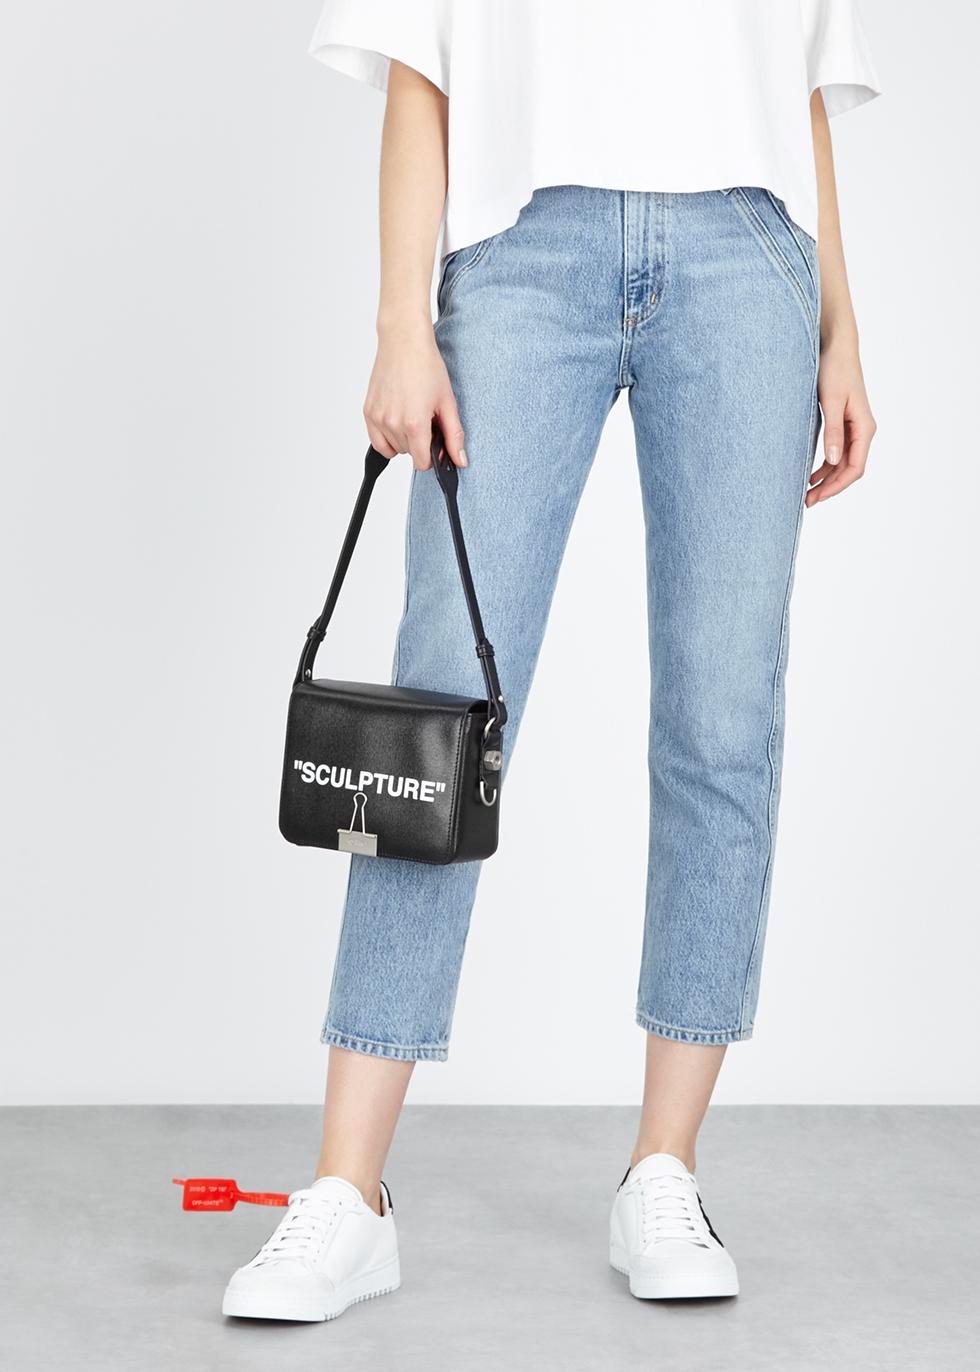 2124d8111b4 Women s Designer Bags